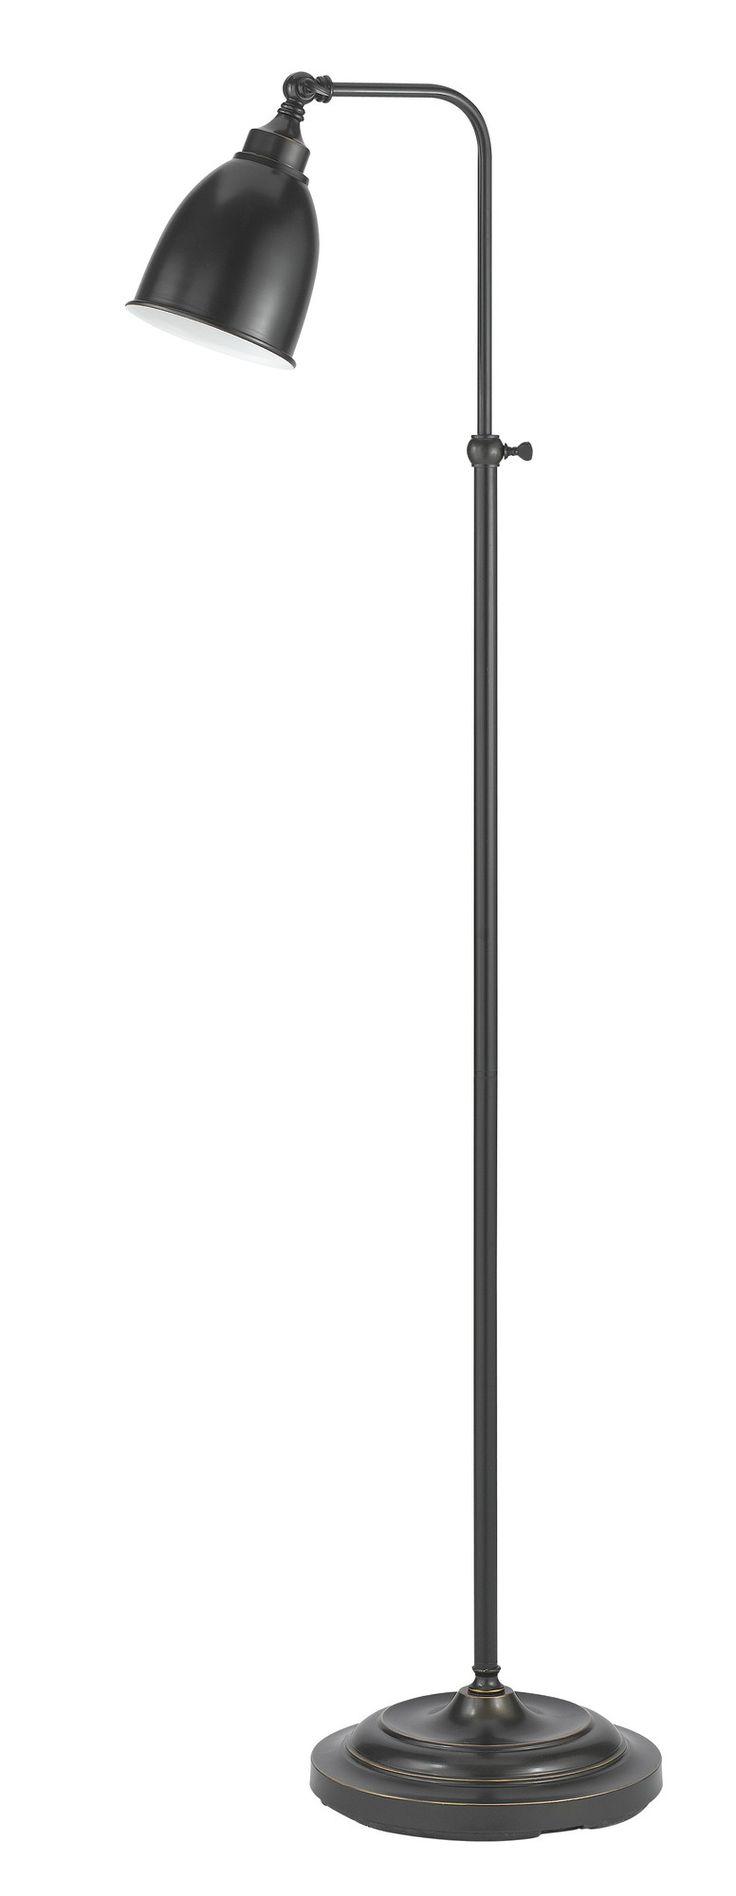 Cal Lighting Boylston Adjustable Floor Lamp U0026 Reviews | Wayfair